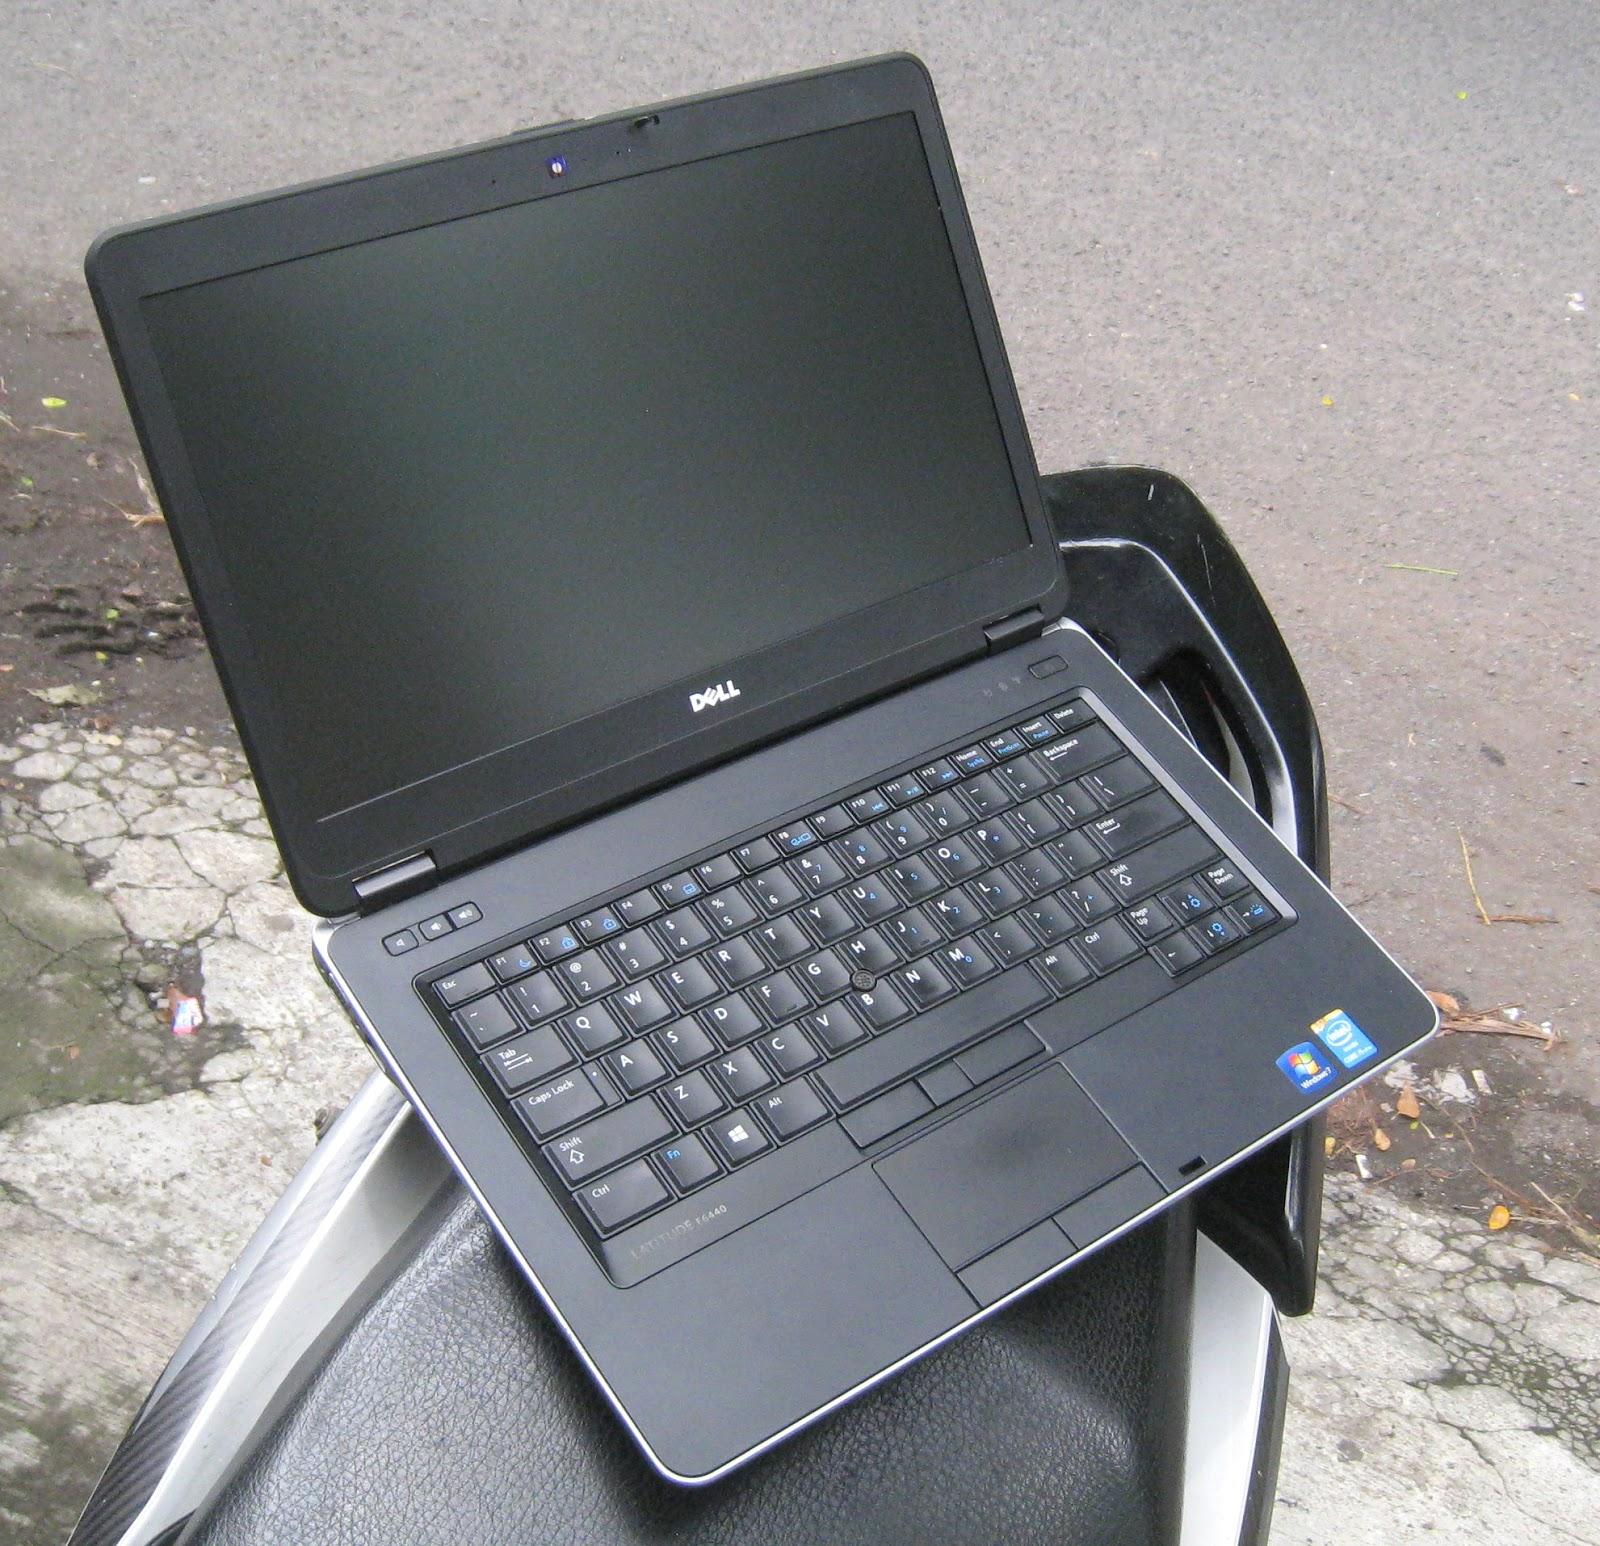 Jual Laptop Dell Latitude E6440 Core I5 Haswell Jual Beli Laptop Bekas Kamera Service Sparepart Di Malang